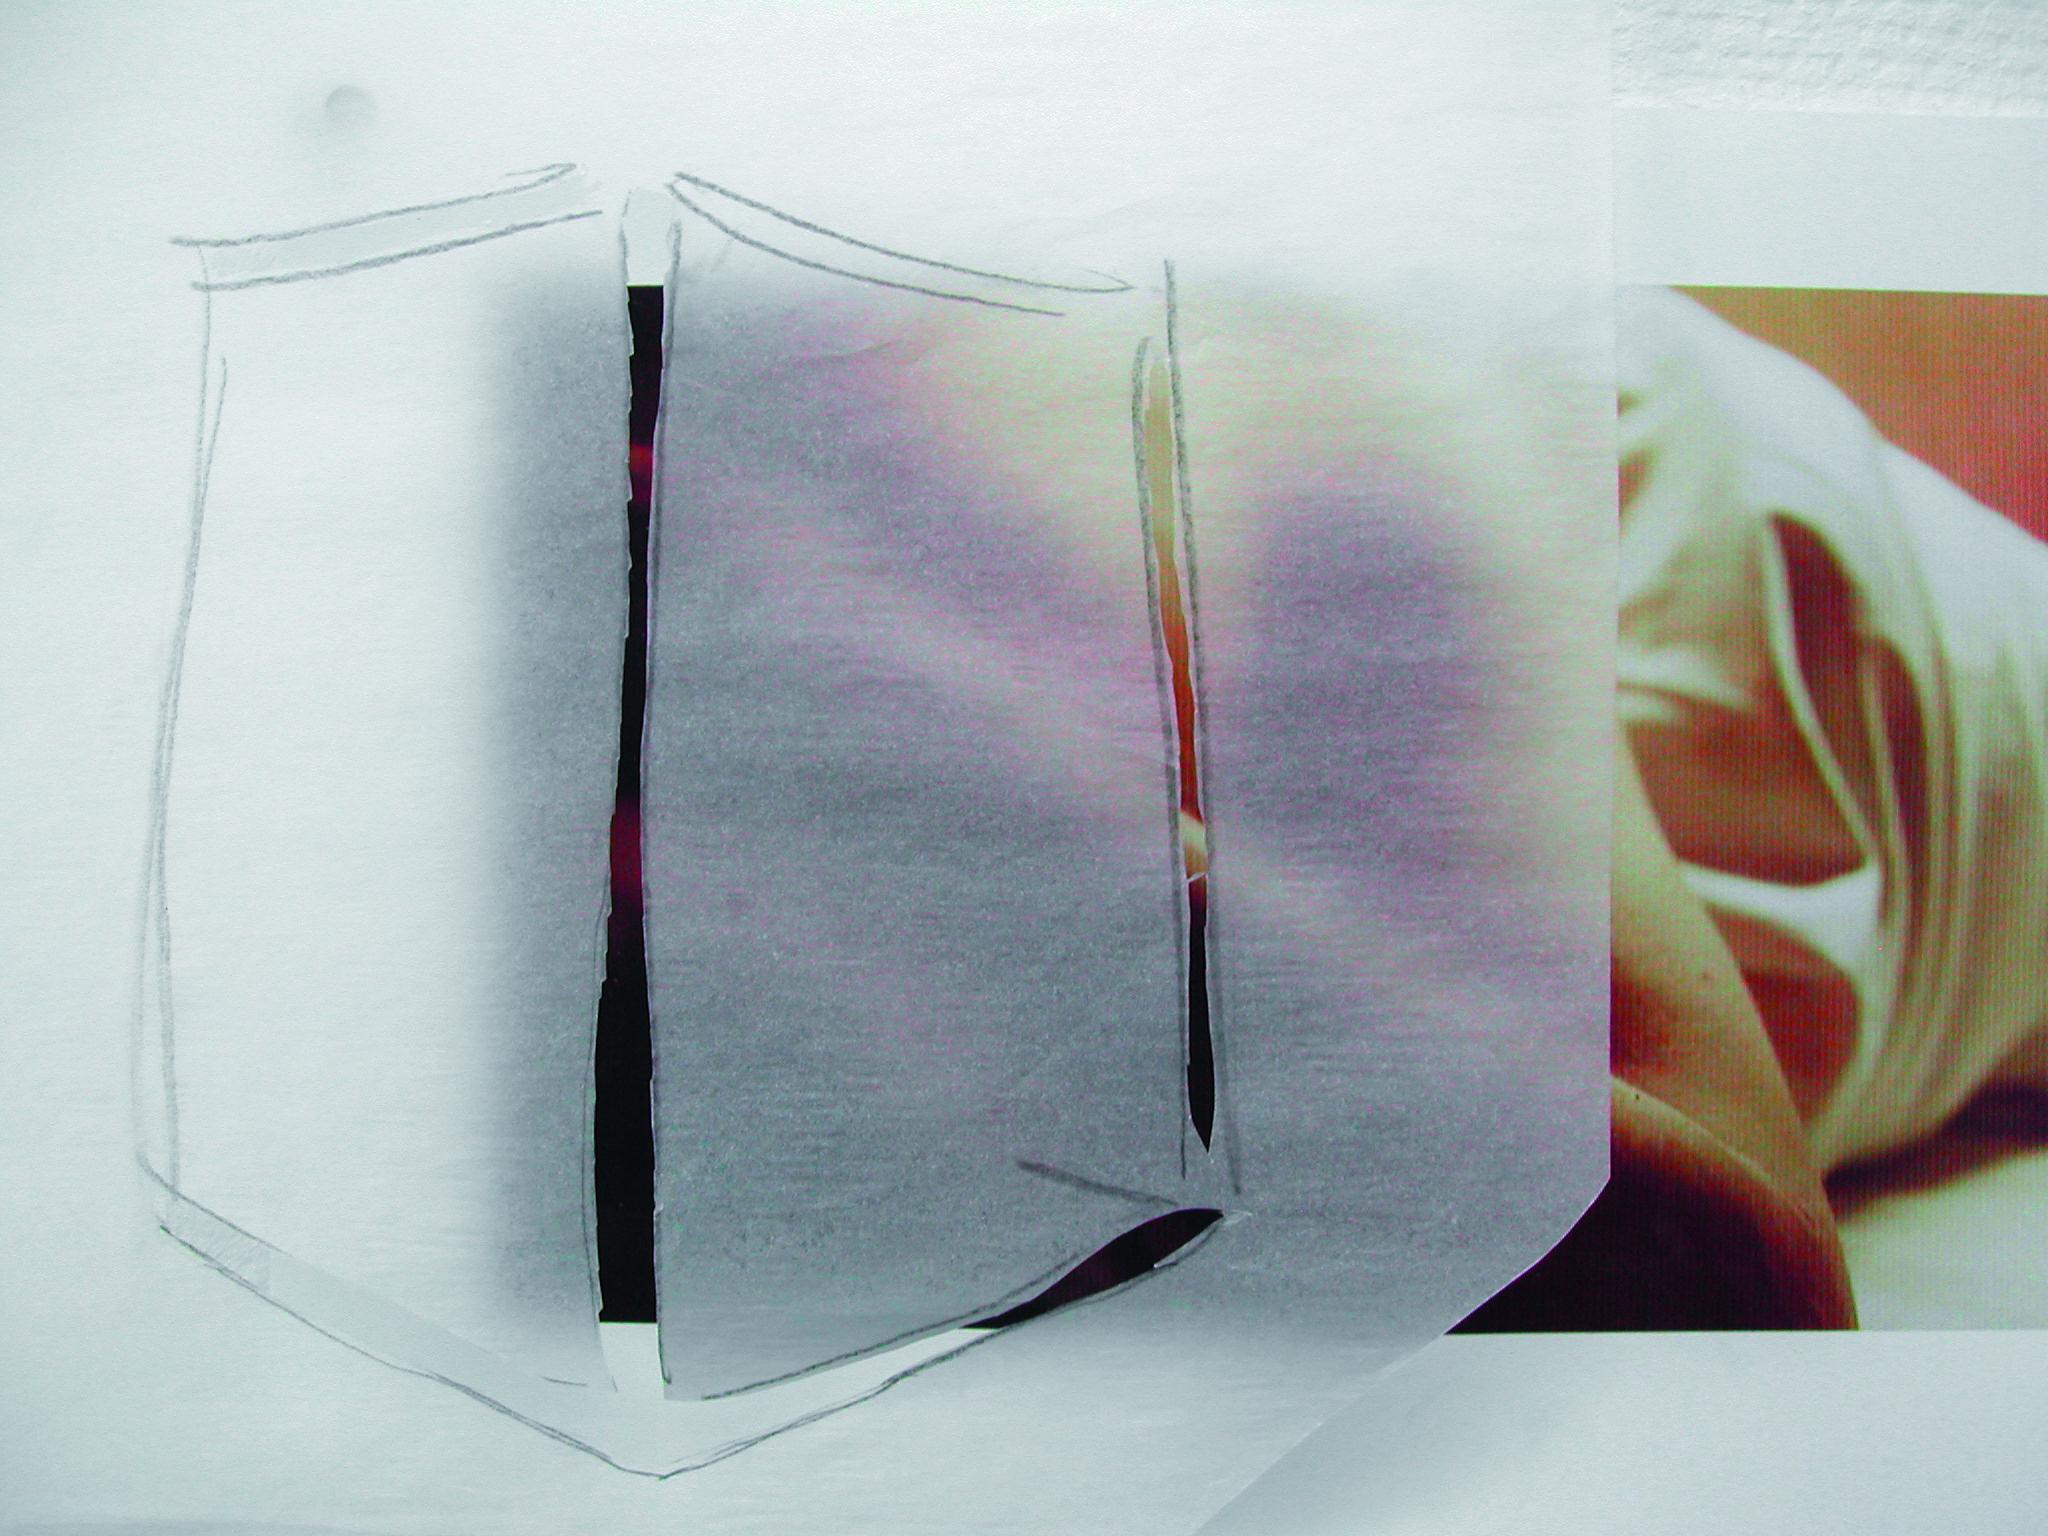 """Geometry of Space"", 2008–2010 © Susa Templin; Courtesy Galerie Thomas Rehbein"